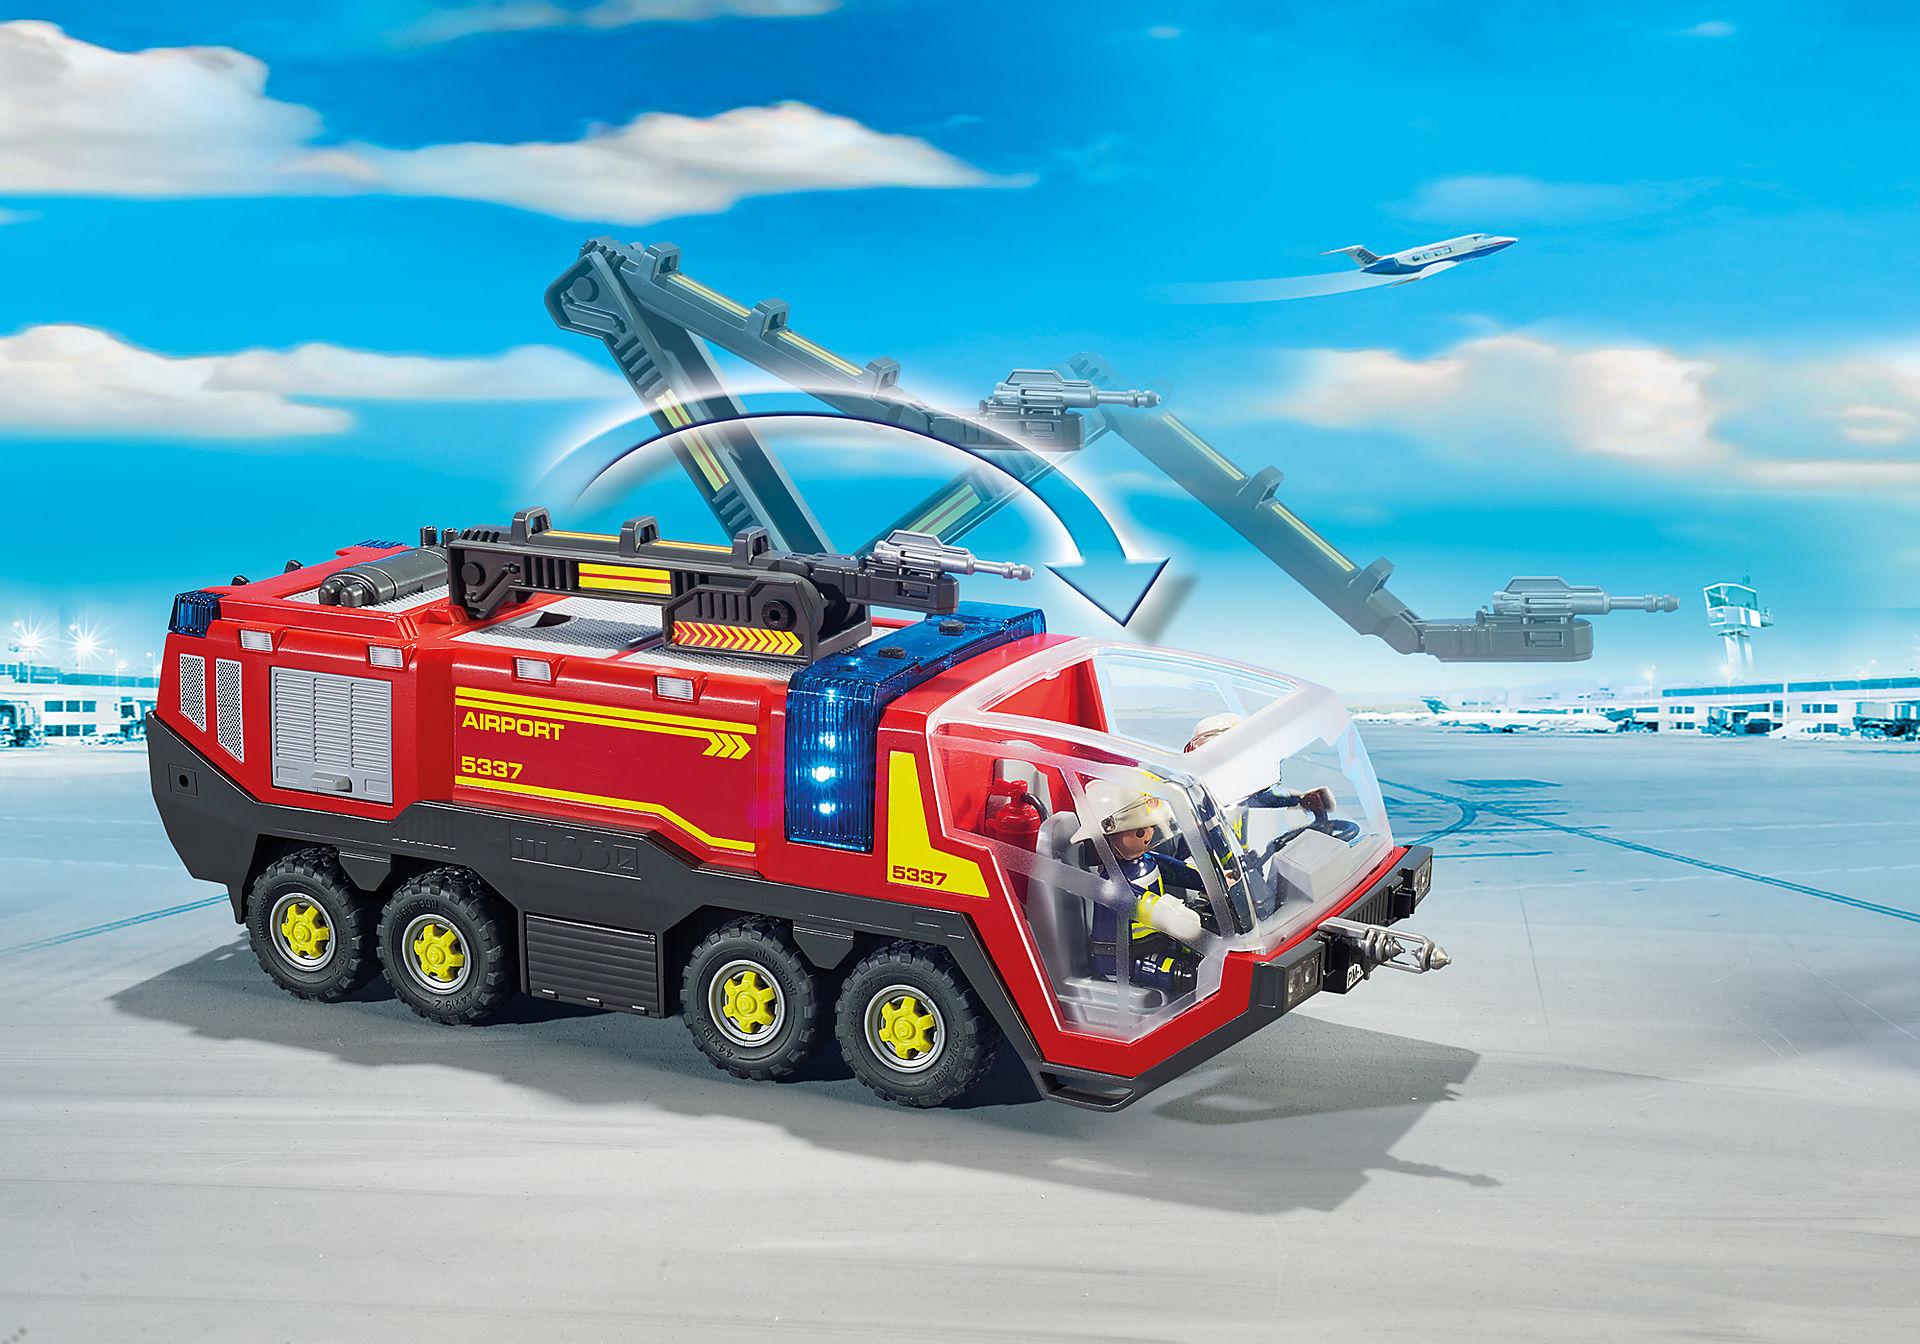 5337 Lufthavnsbrandbil med lys og lyd zoom image8